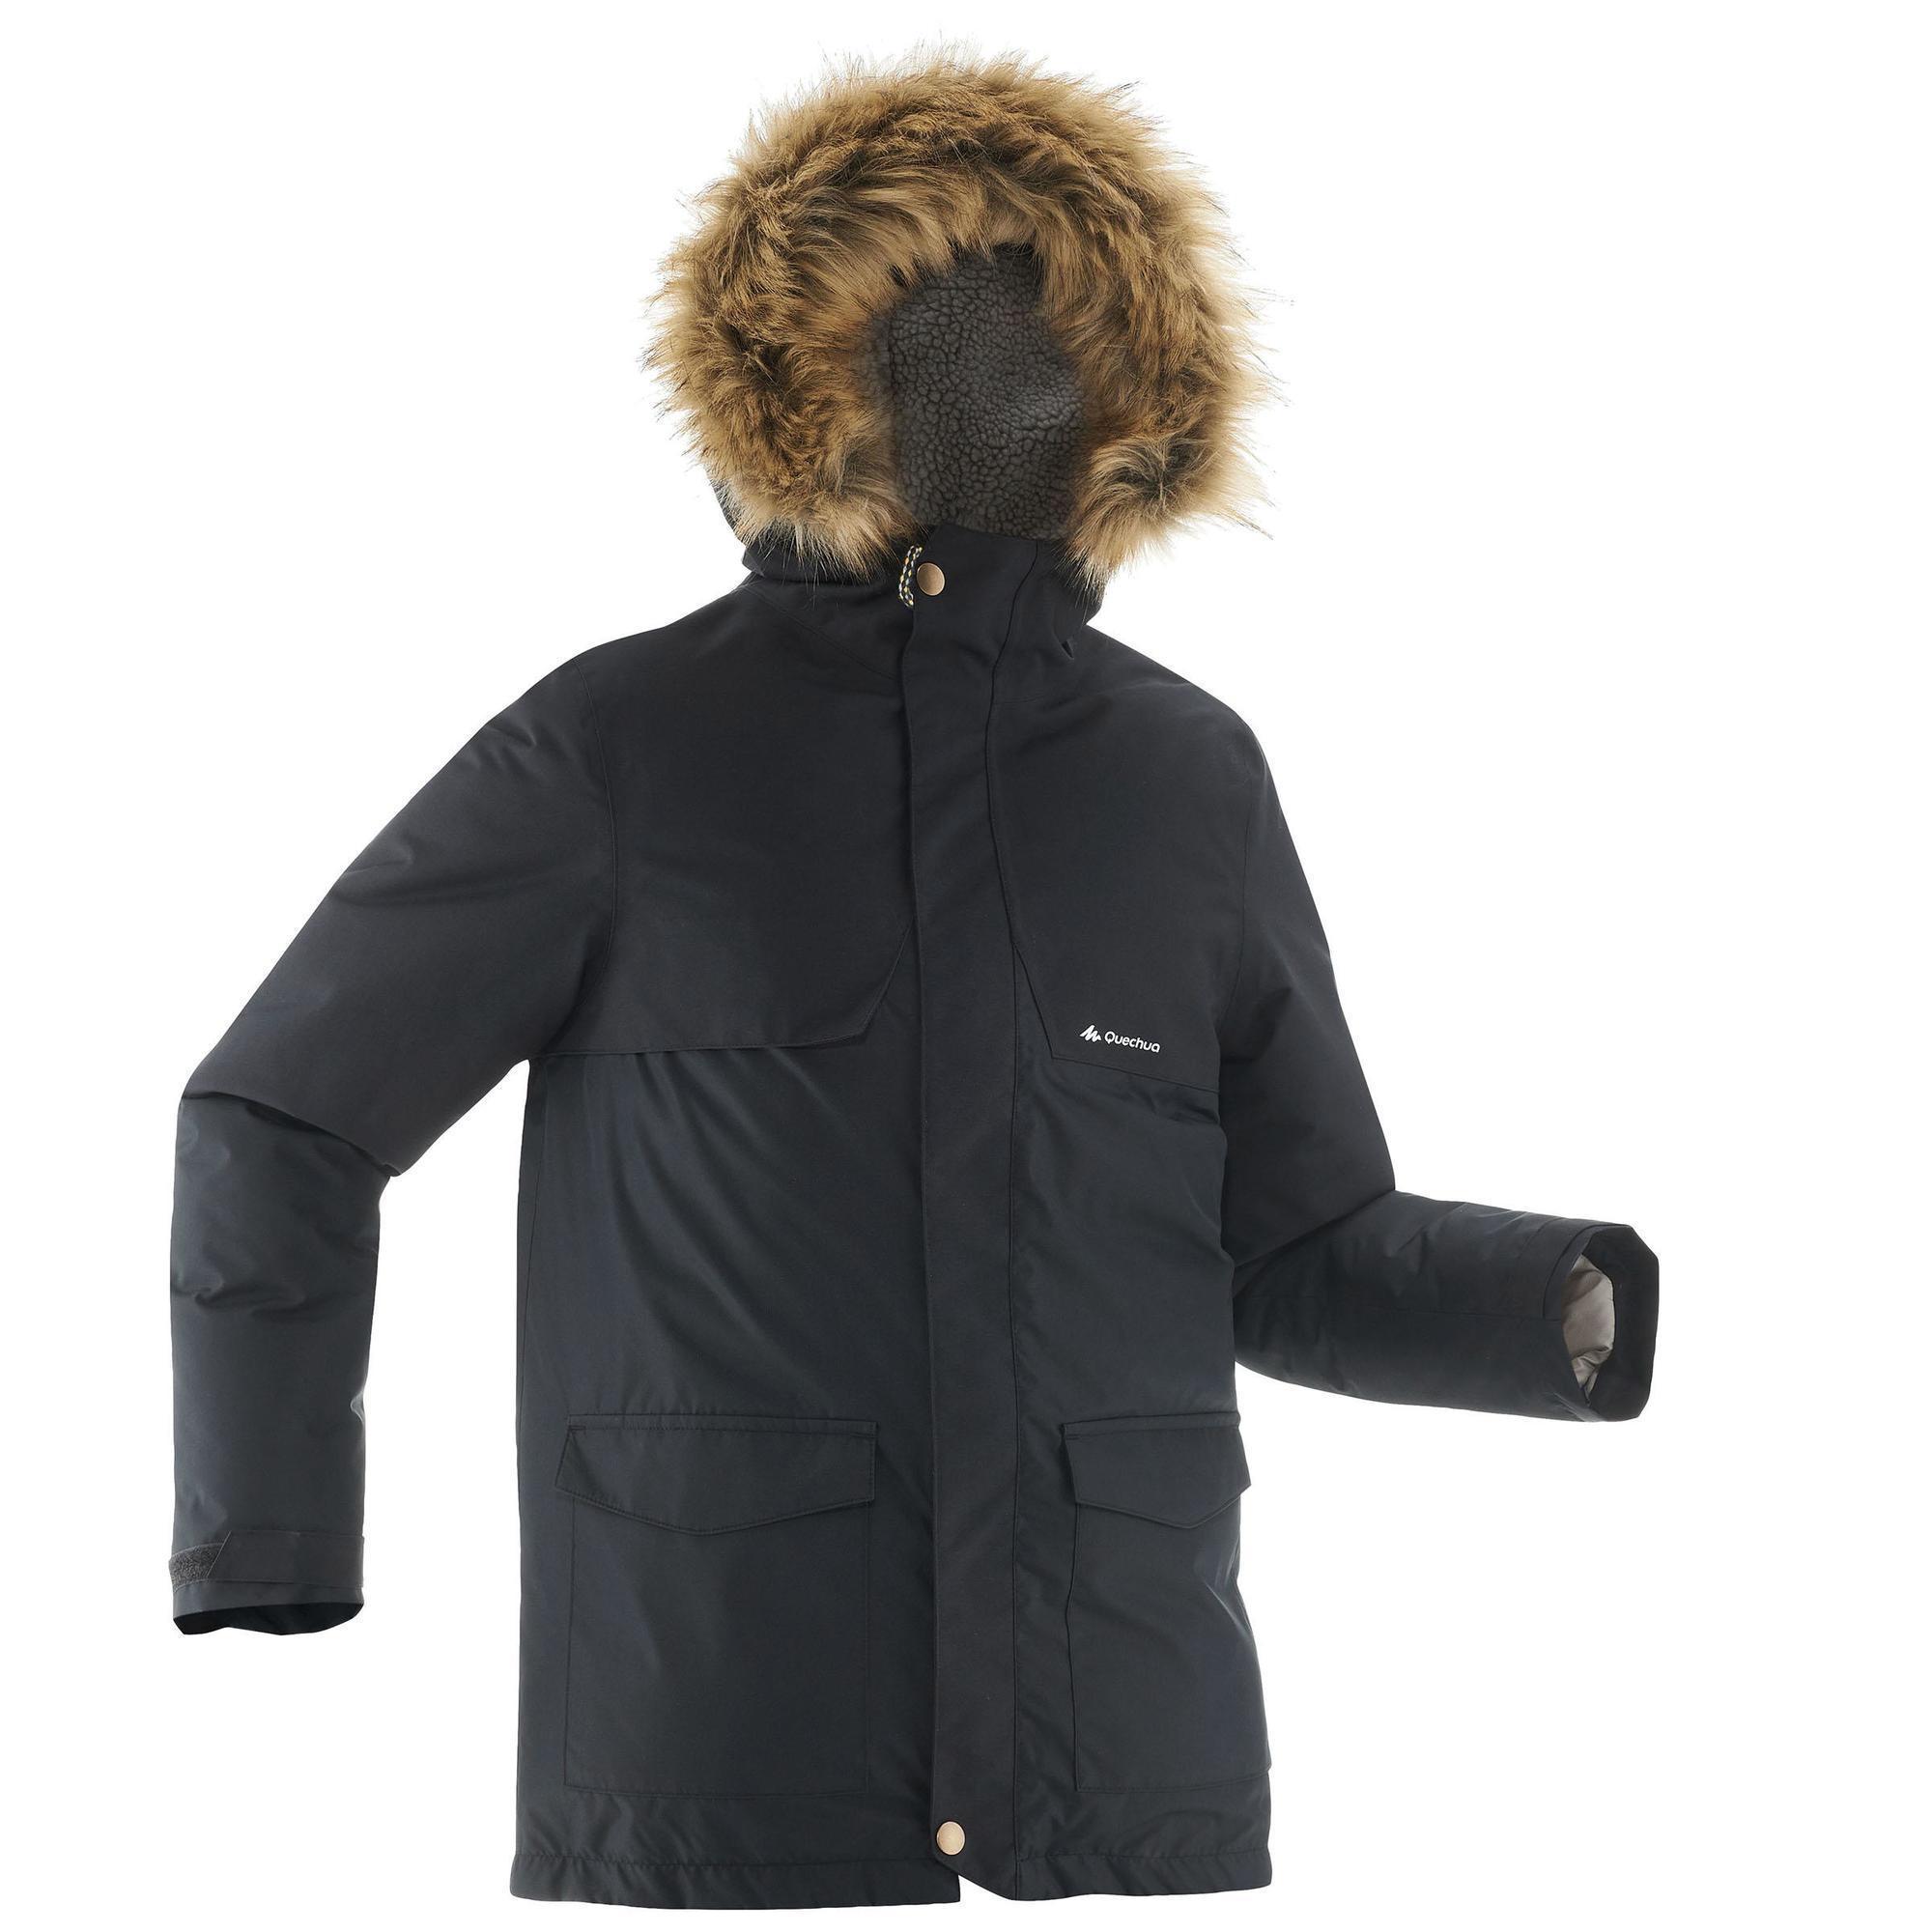 Jungen,Kinder Wanderjacke SH500 X-Warm Kinder schwarz | 03608439420771